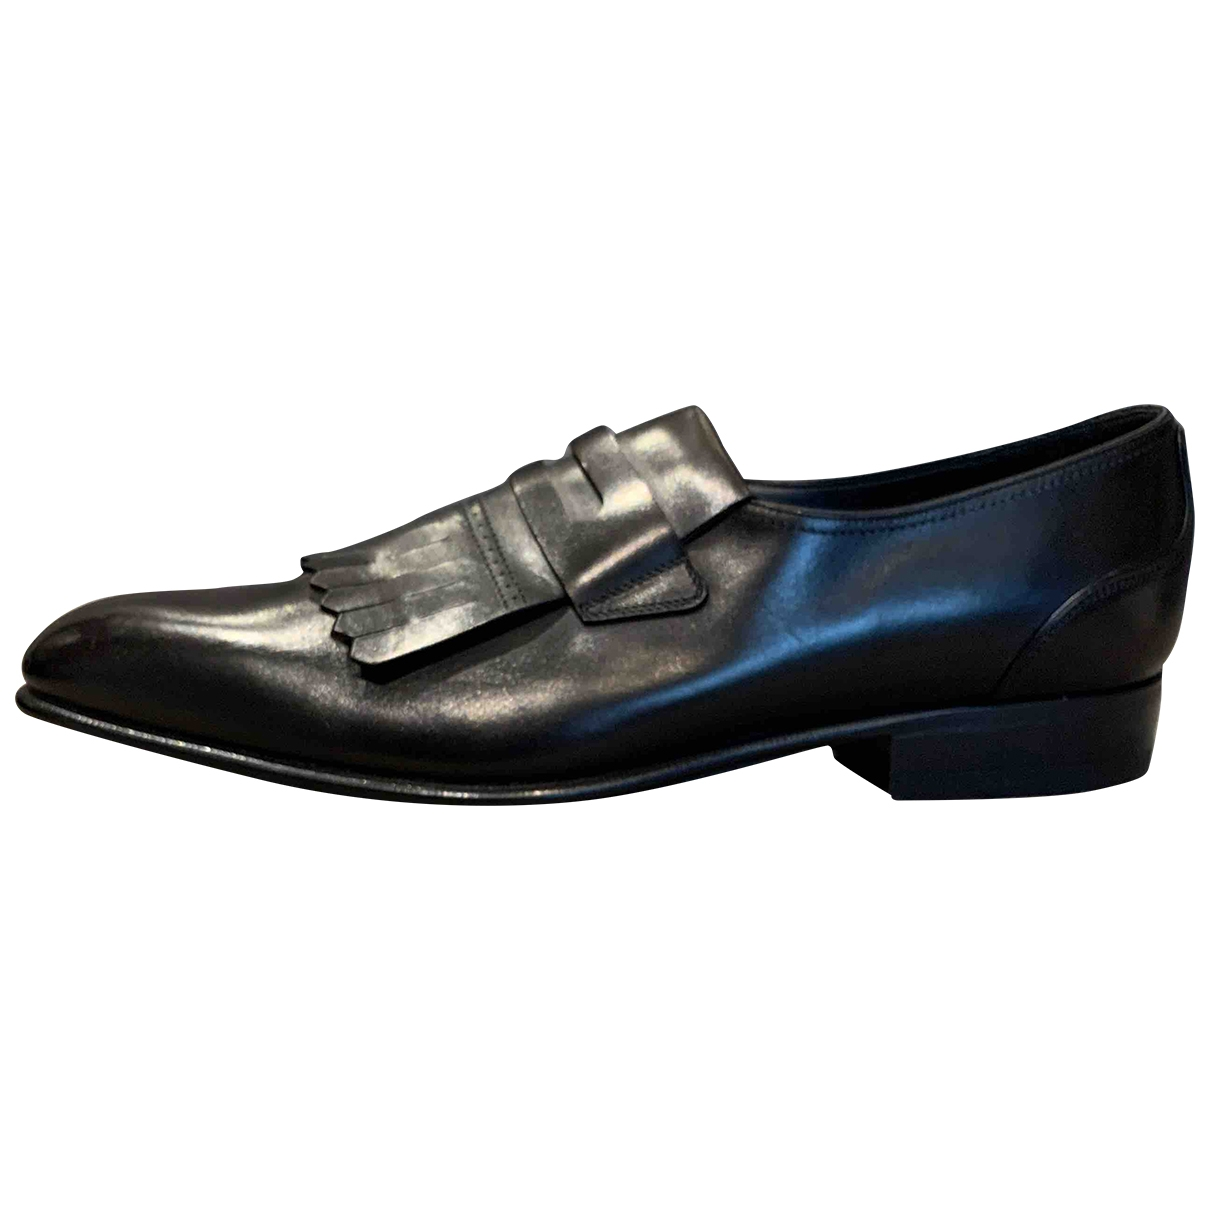 Sergio Rossi \N Black Leather Flats for Men 41.5 EU